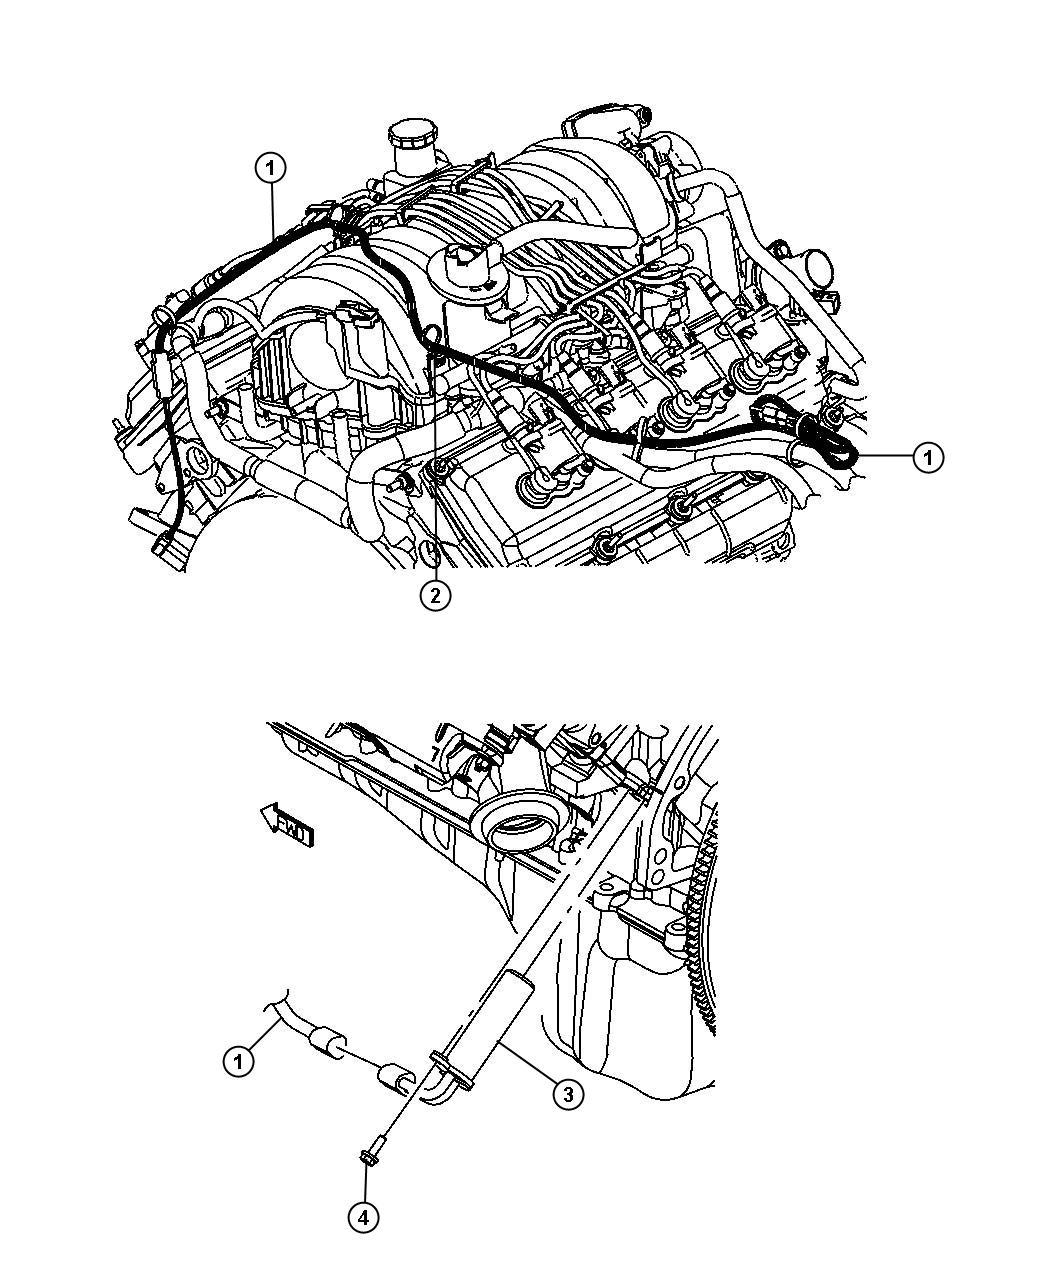 Dodge Charger Rwd Str8 6 4l V8 Srt Hemi Mds 5 Speed Auto W5a580 Engine Cylinder Block Heater 6